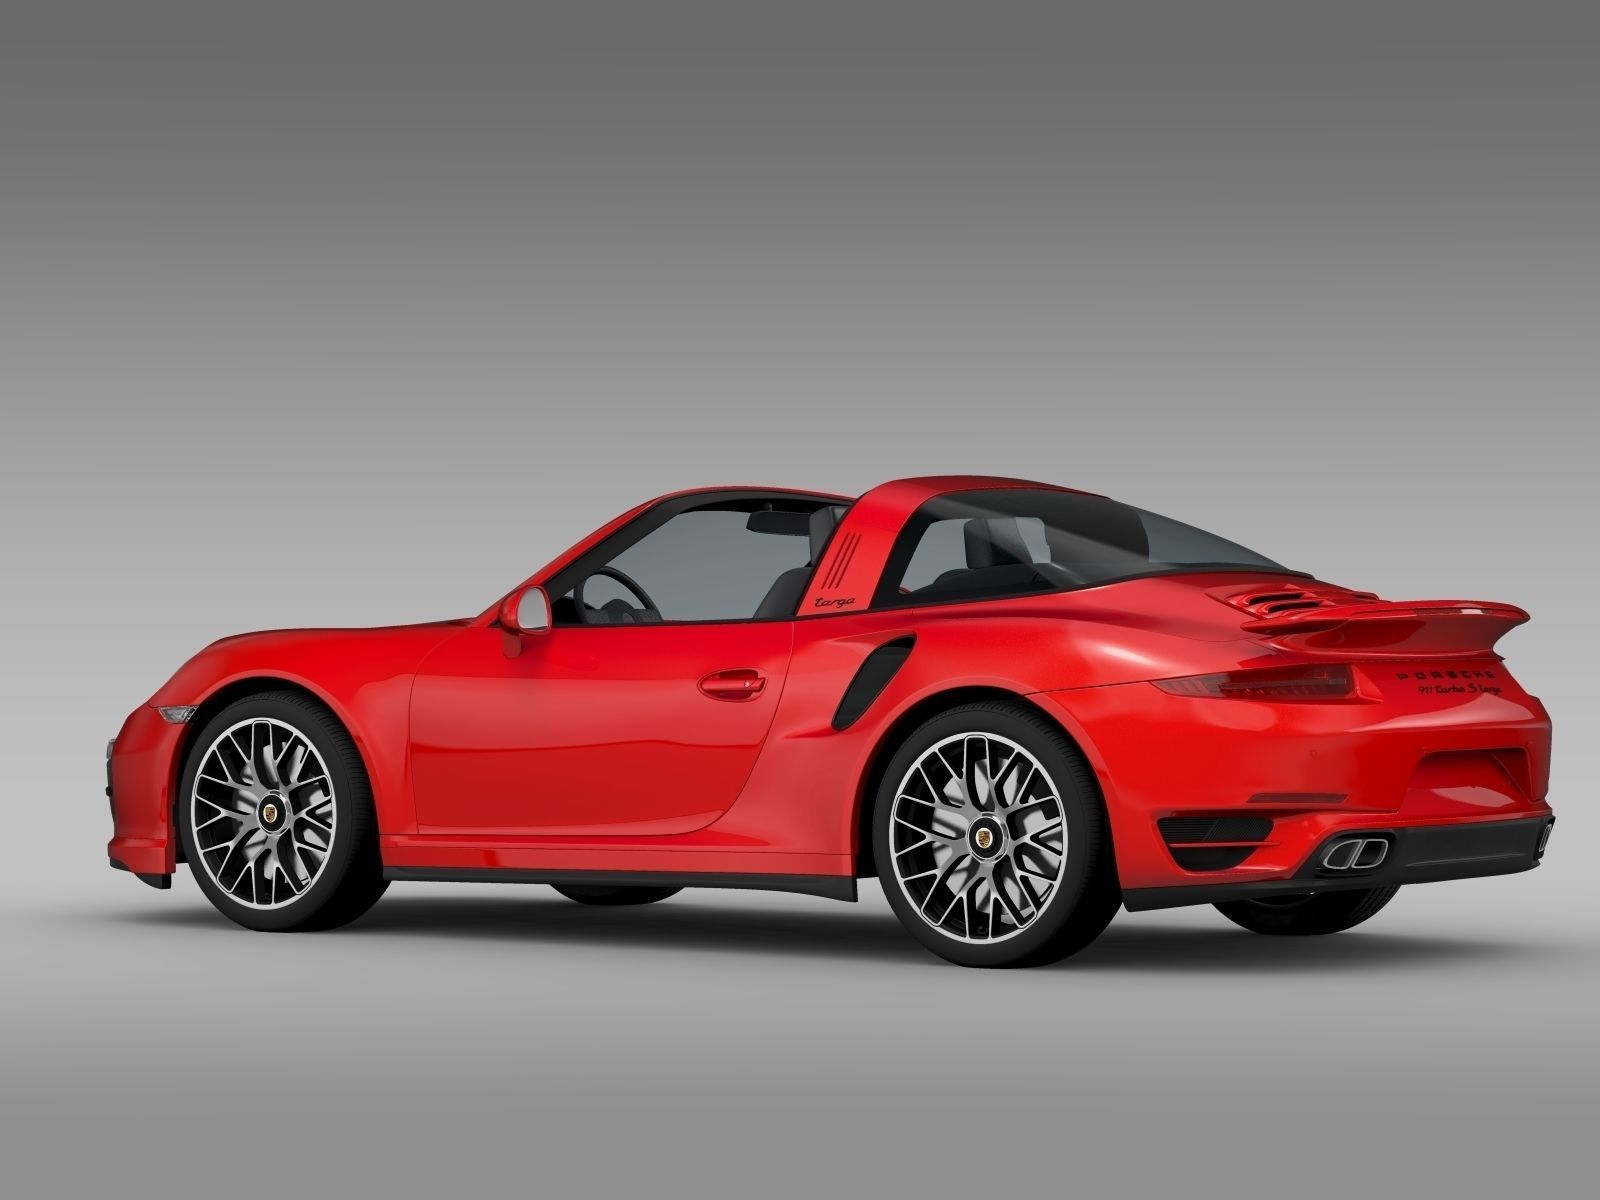 porsche 911 turbo s targa 991 2015 3d model max obj 3ds fbx c4d lwo lw